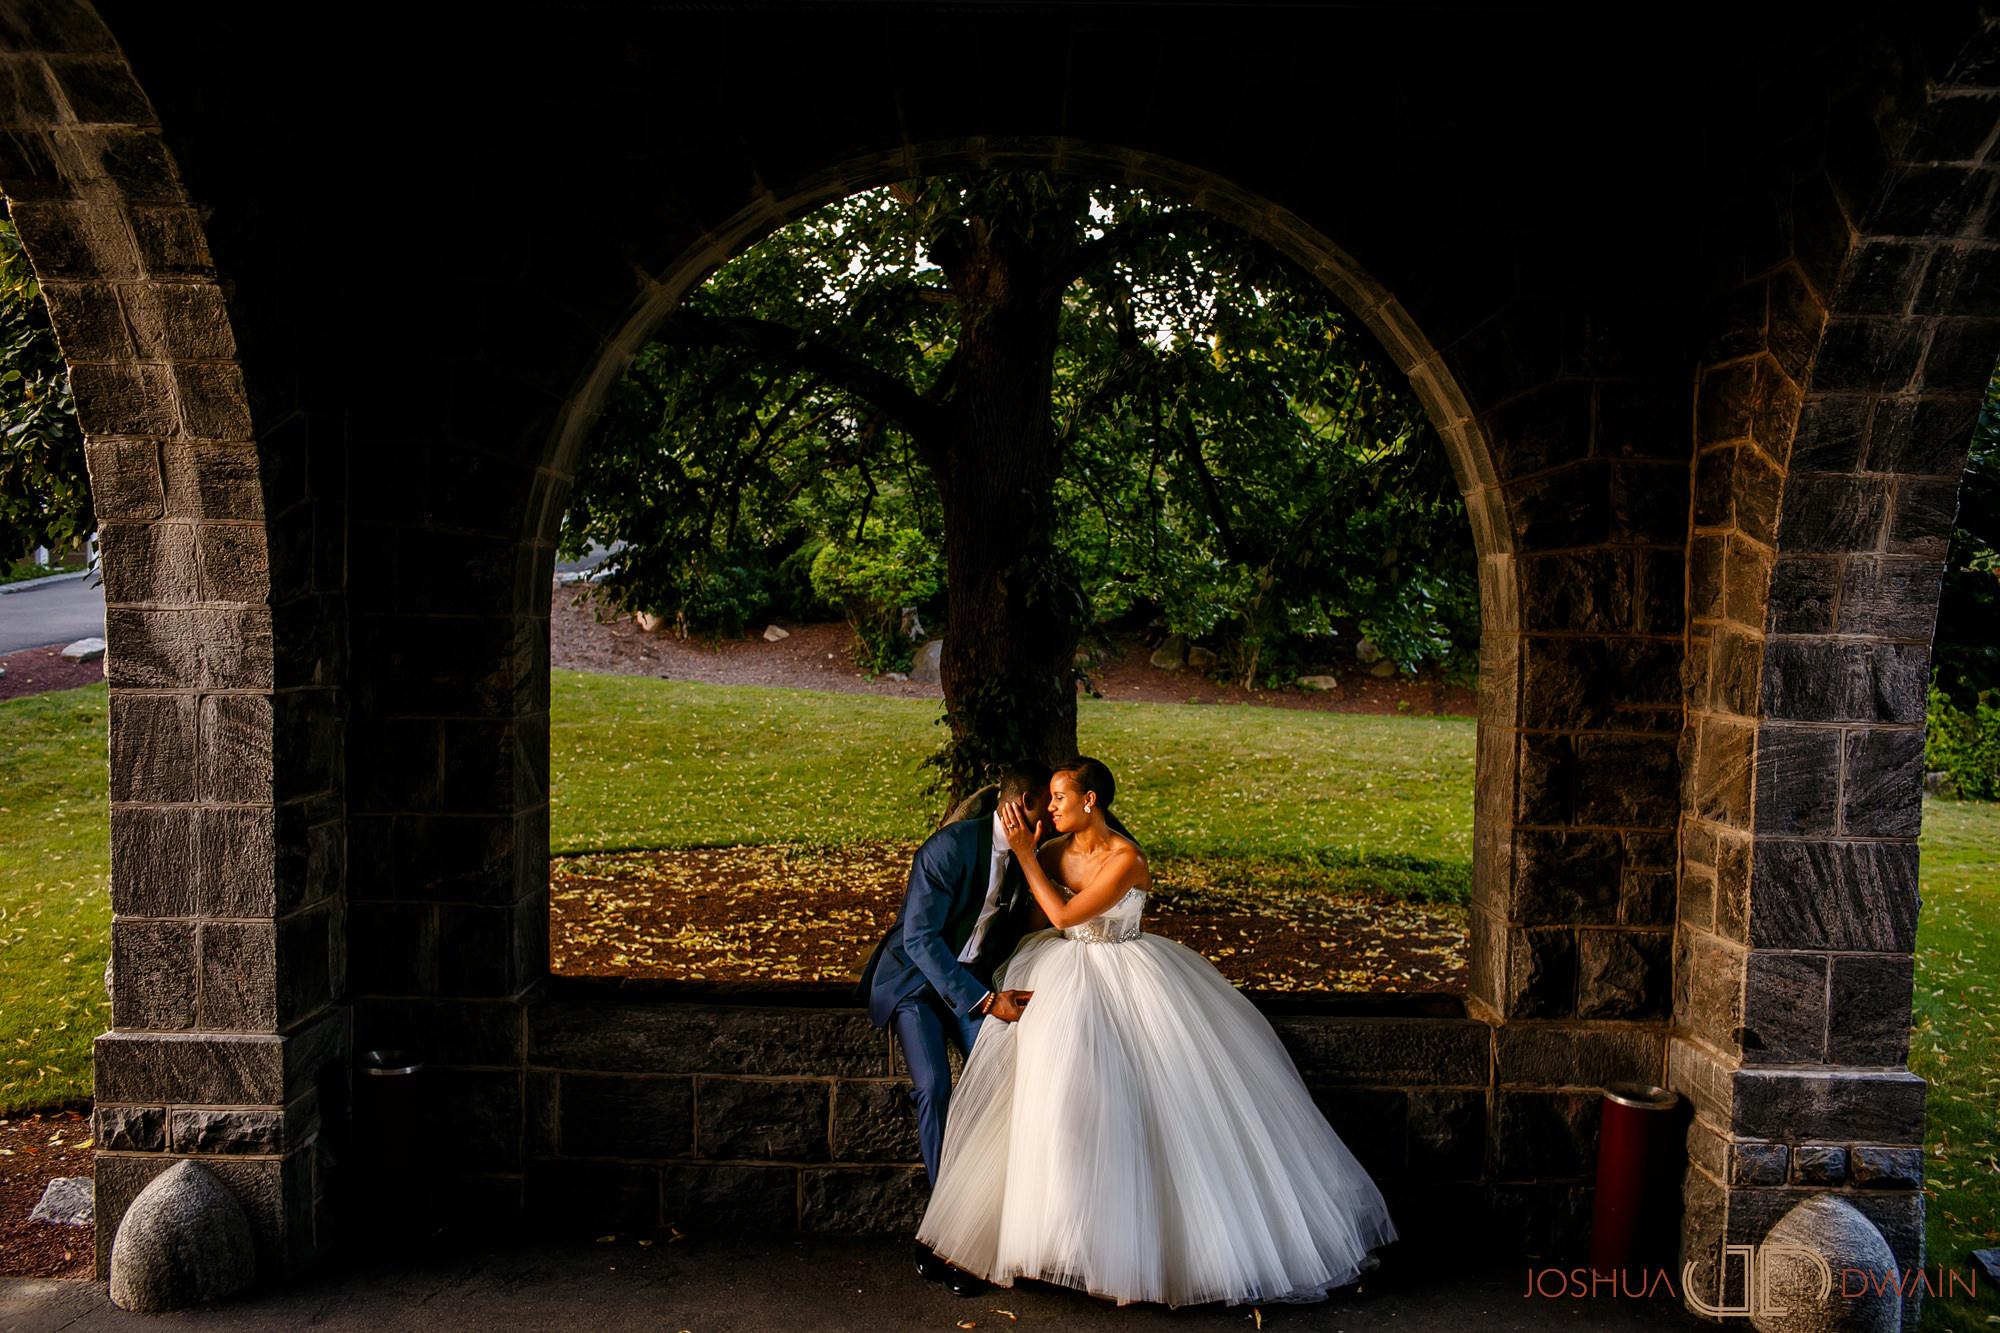 brandie-brendan-35-tarrytown-house-estate-conference-center-wedding-photos-joshua-dwain